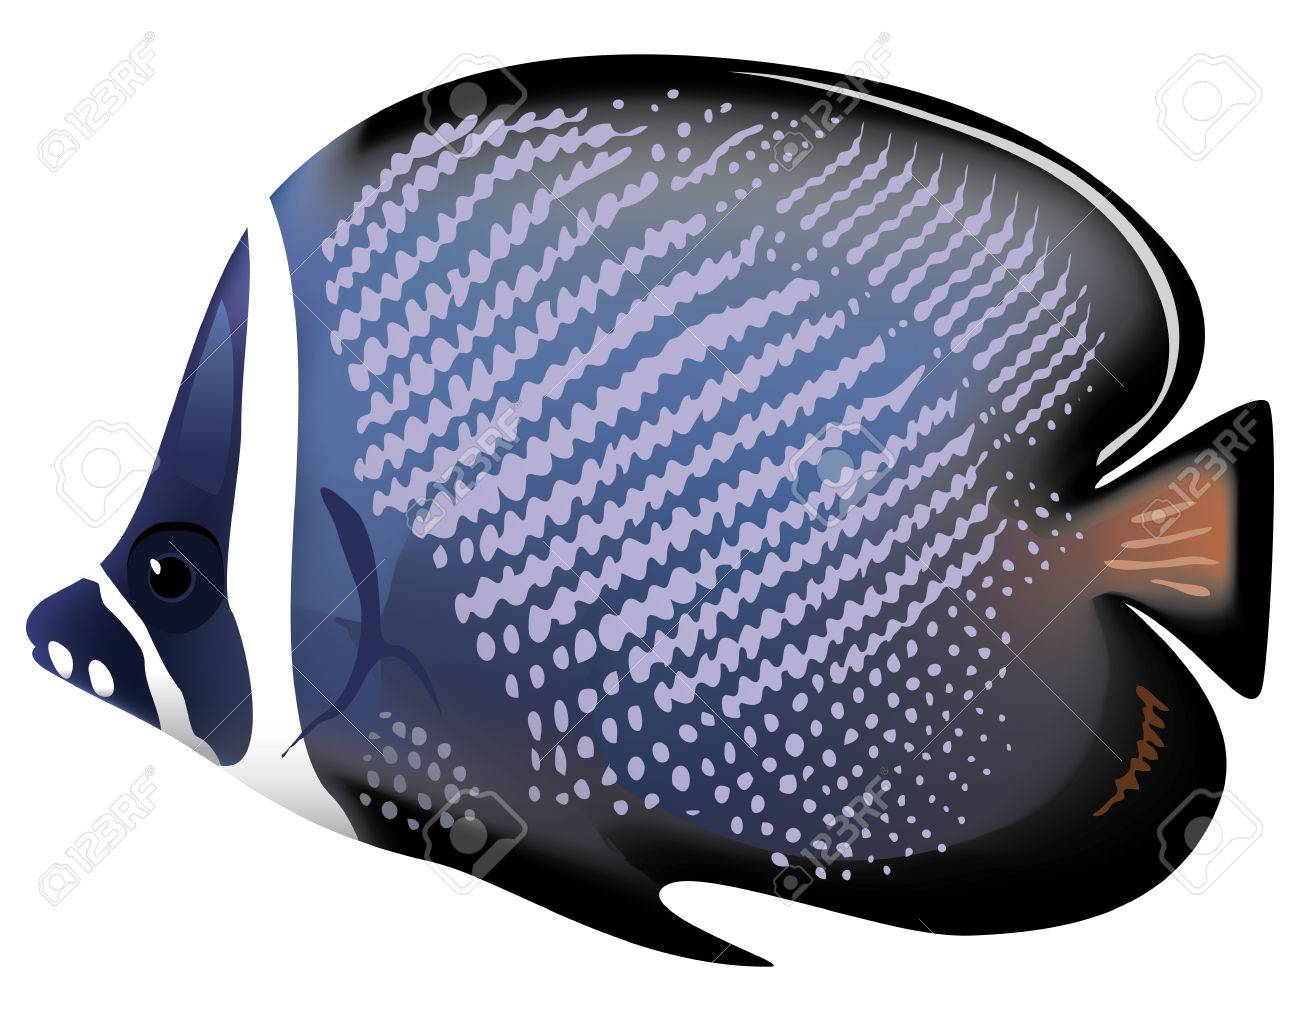 Tropical fish Chaetodon collare. illustration. Stock Vector - 8595916